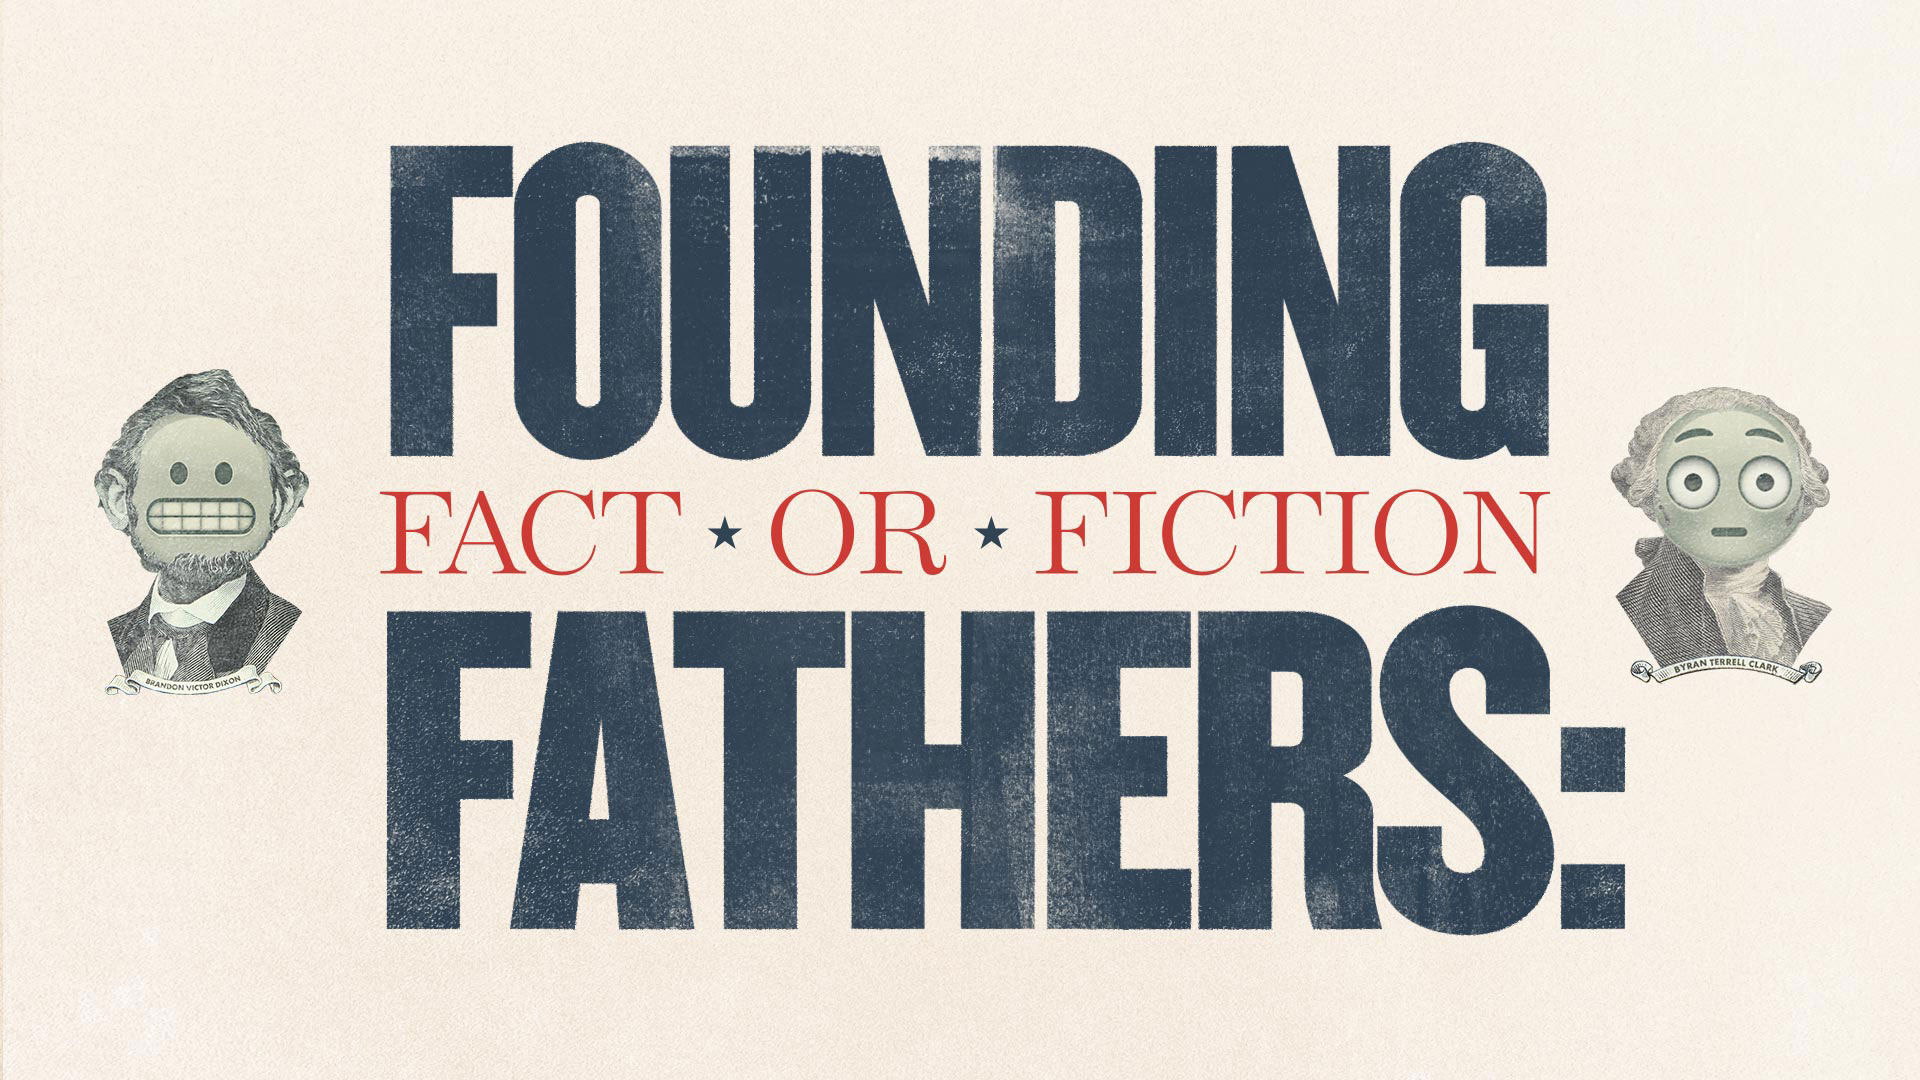 MTV-FoundingFathers-1.png